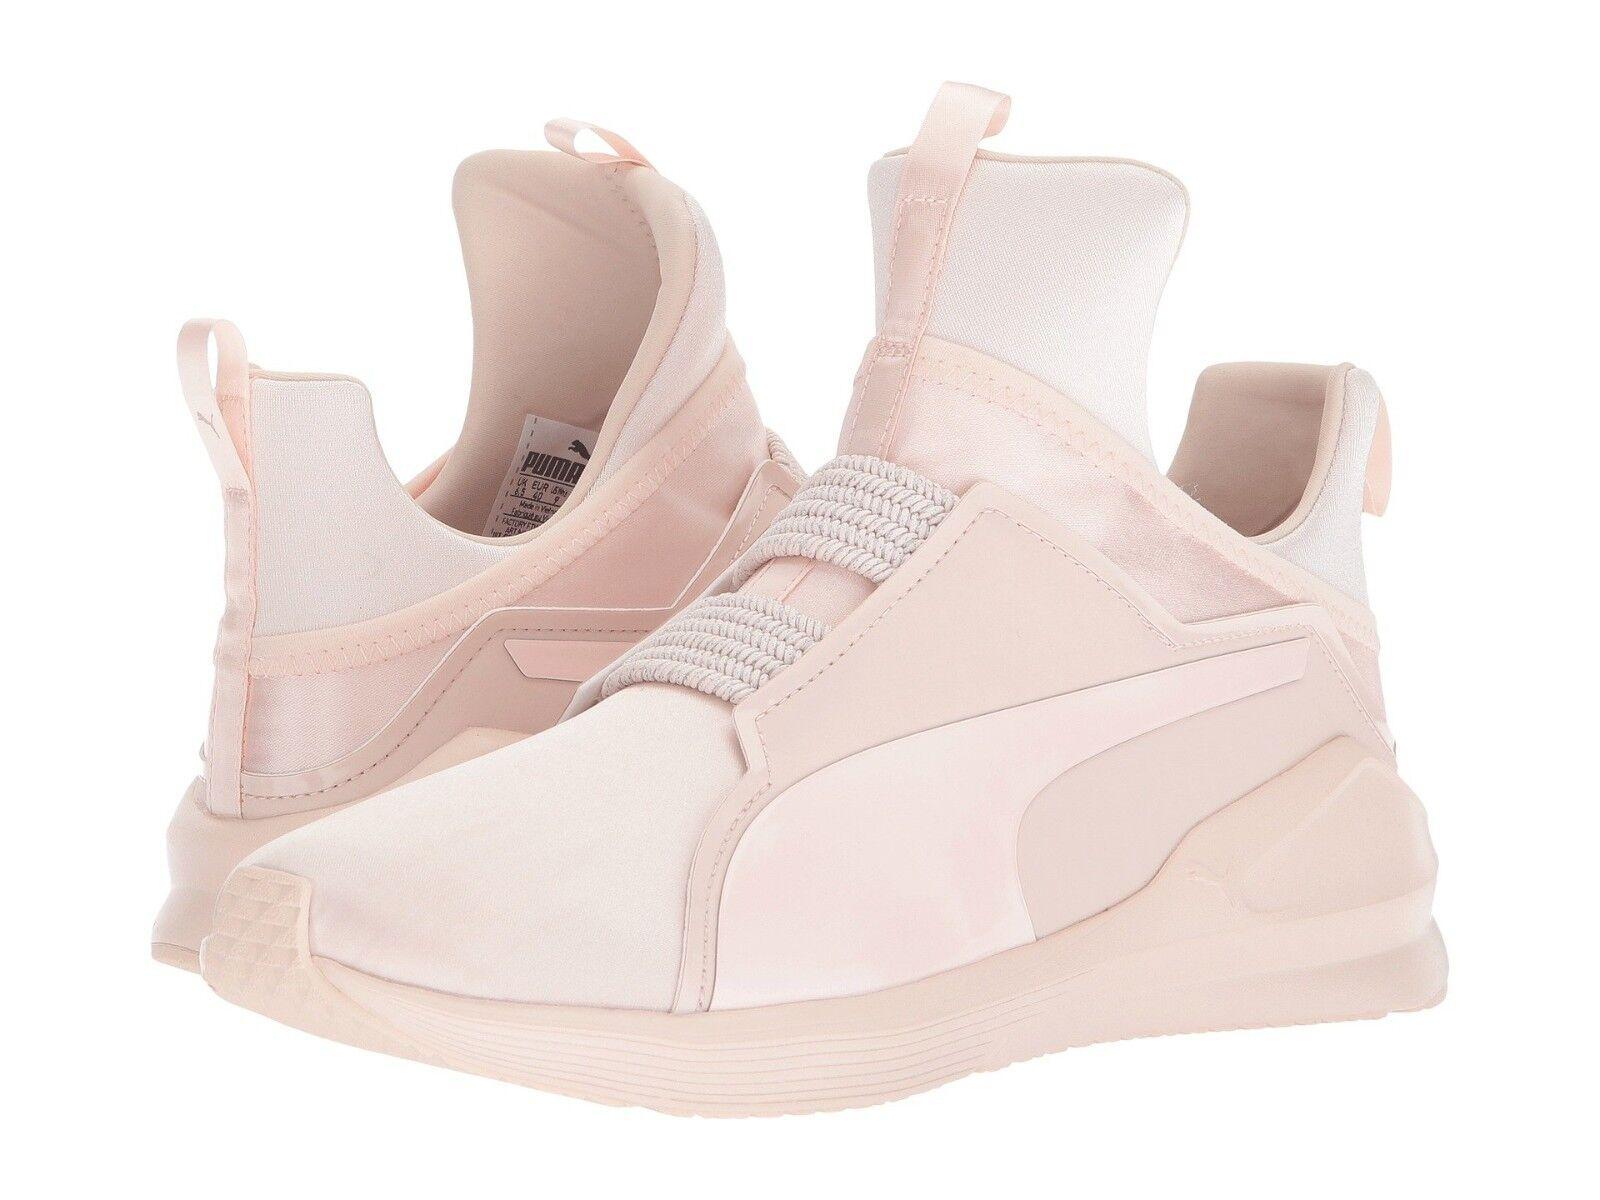 Women's Shoes PUMA Fierce Satin EP Hightop  Lace Sneaker 19054502 Pearl  Hightop New 9b0011